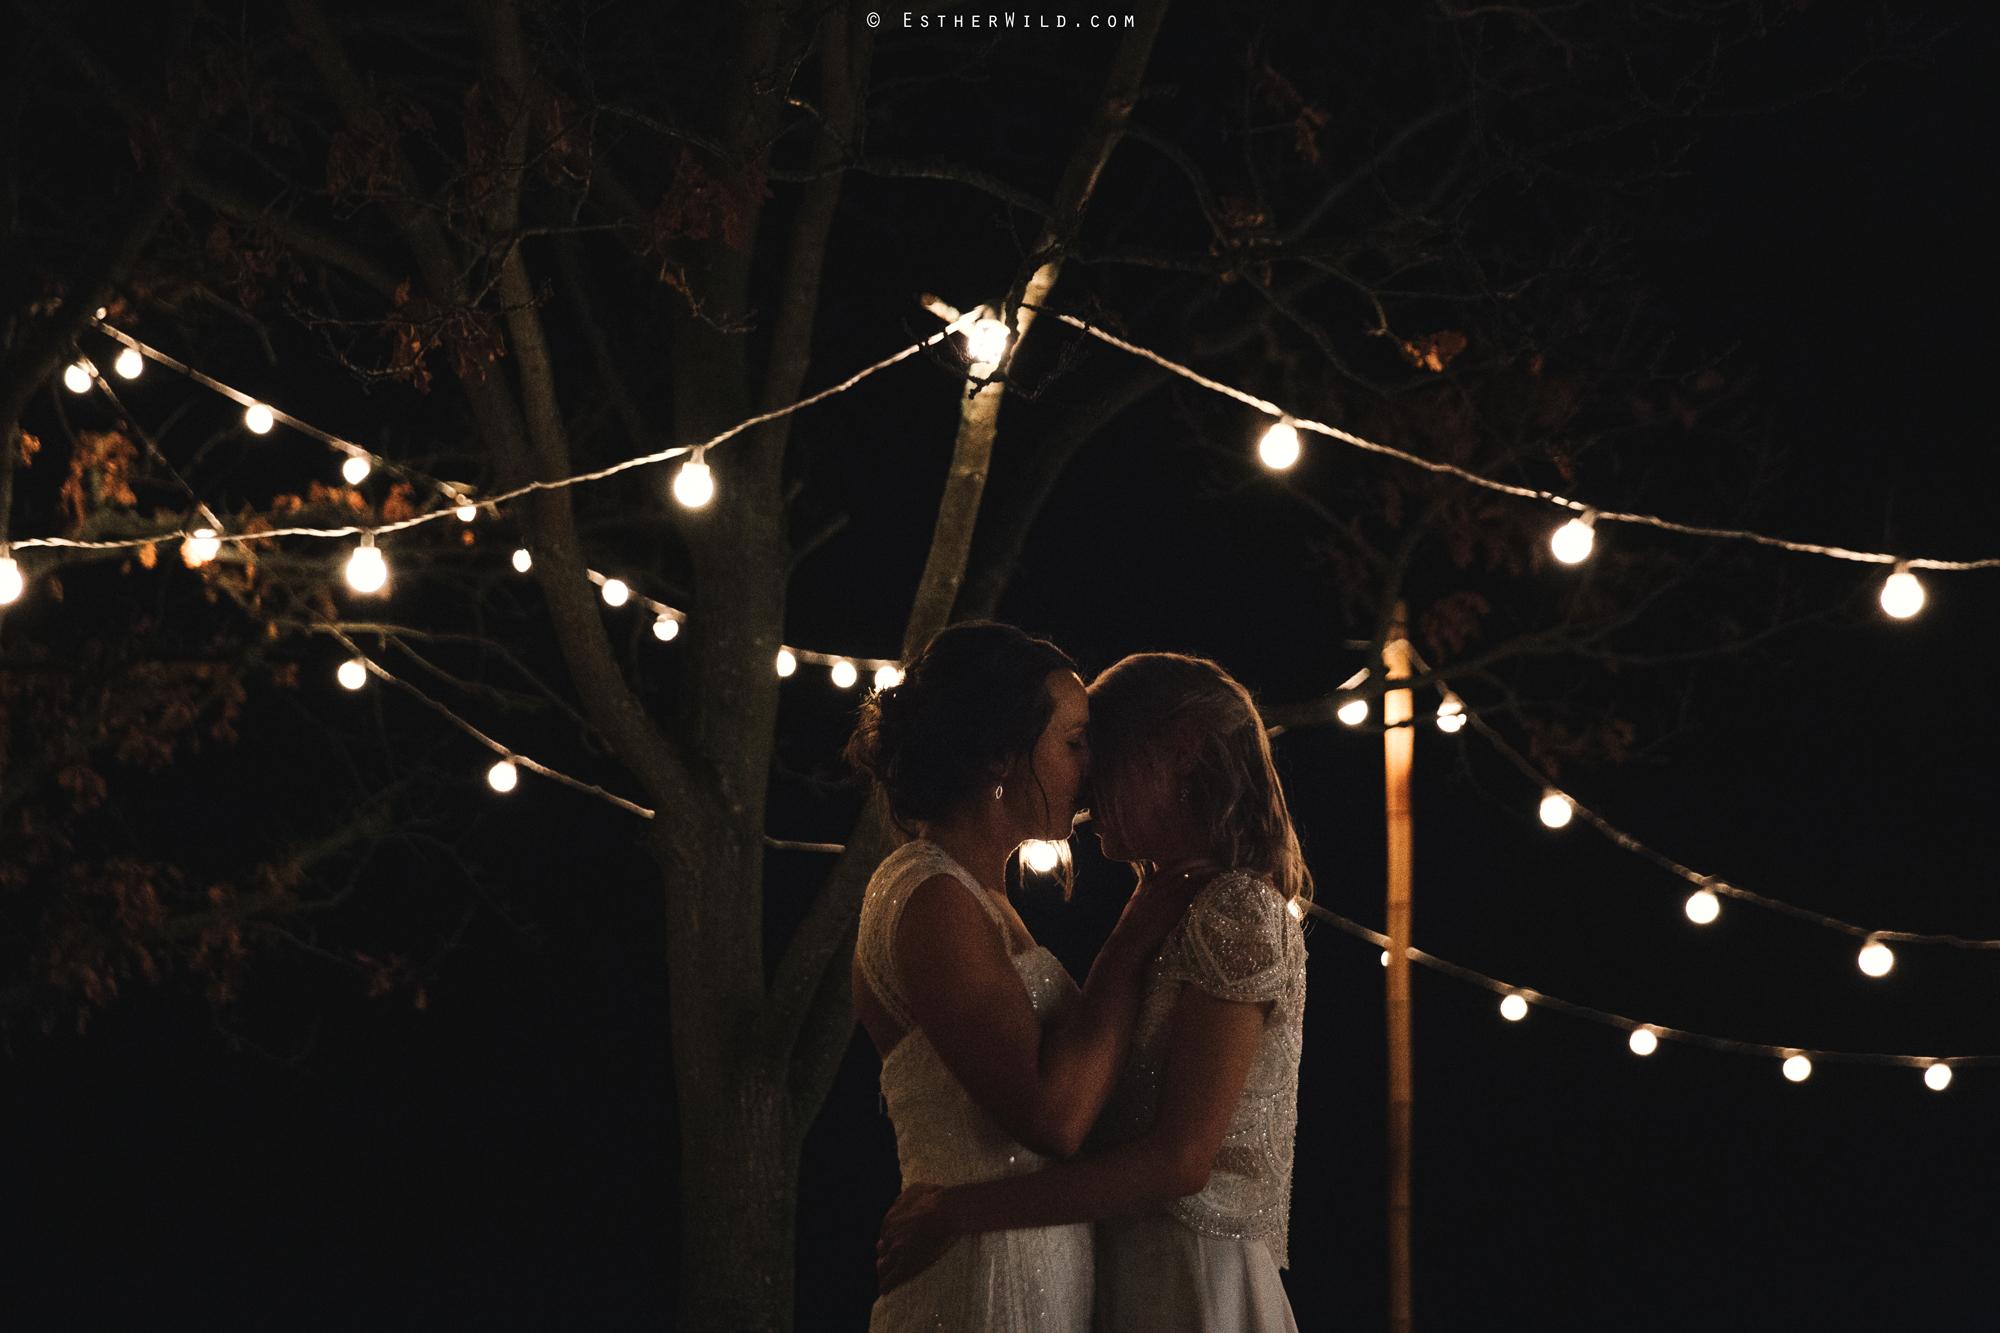 Elms_Barn_Weddings_Suffolk_Photographer_Copyright_Esther_Wild_IMG_3223.jpg